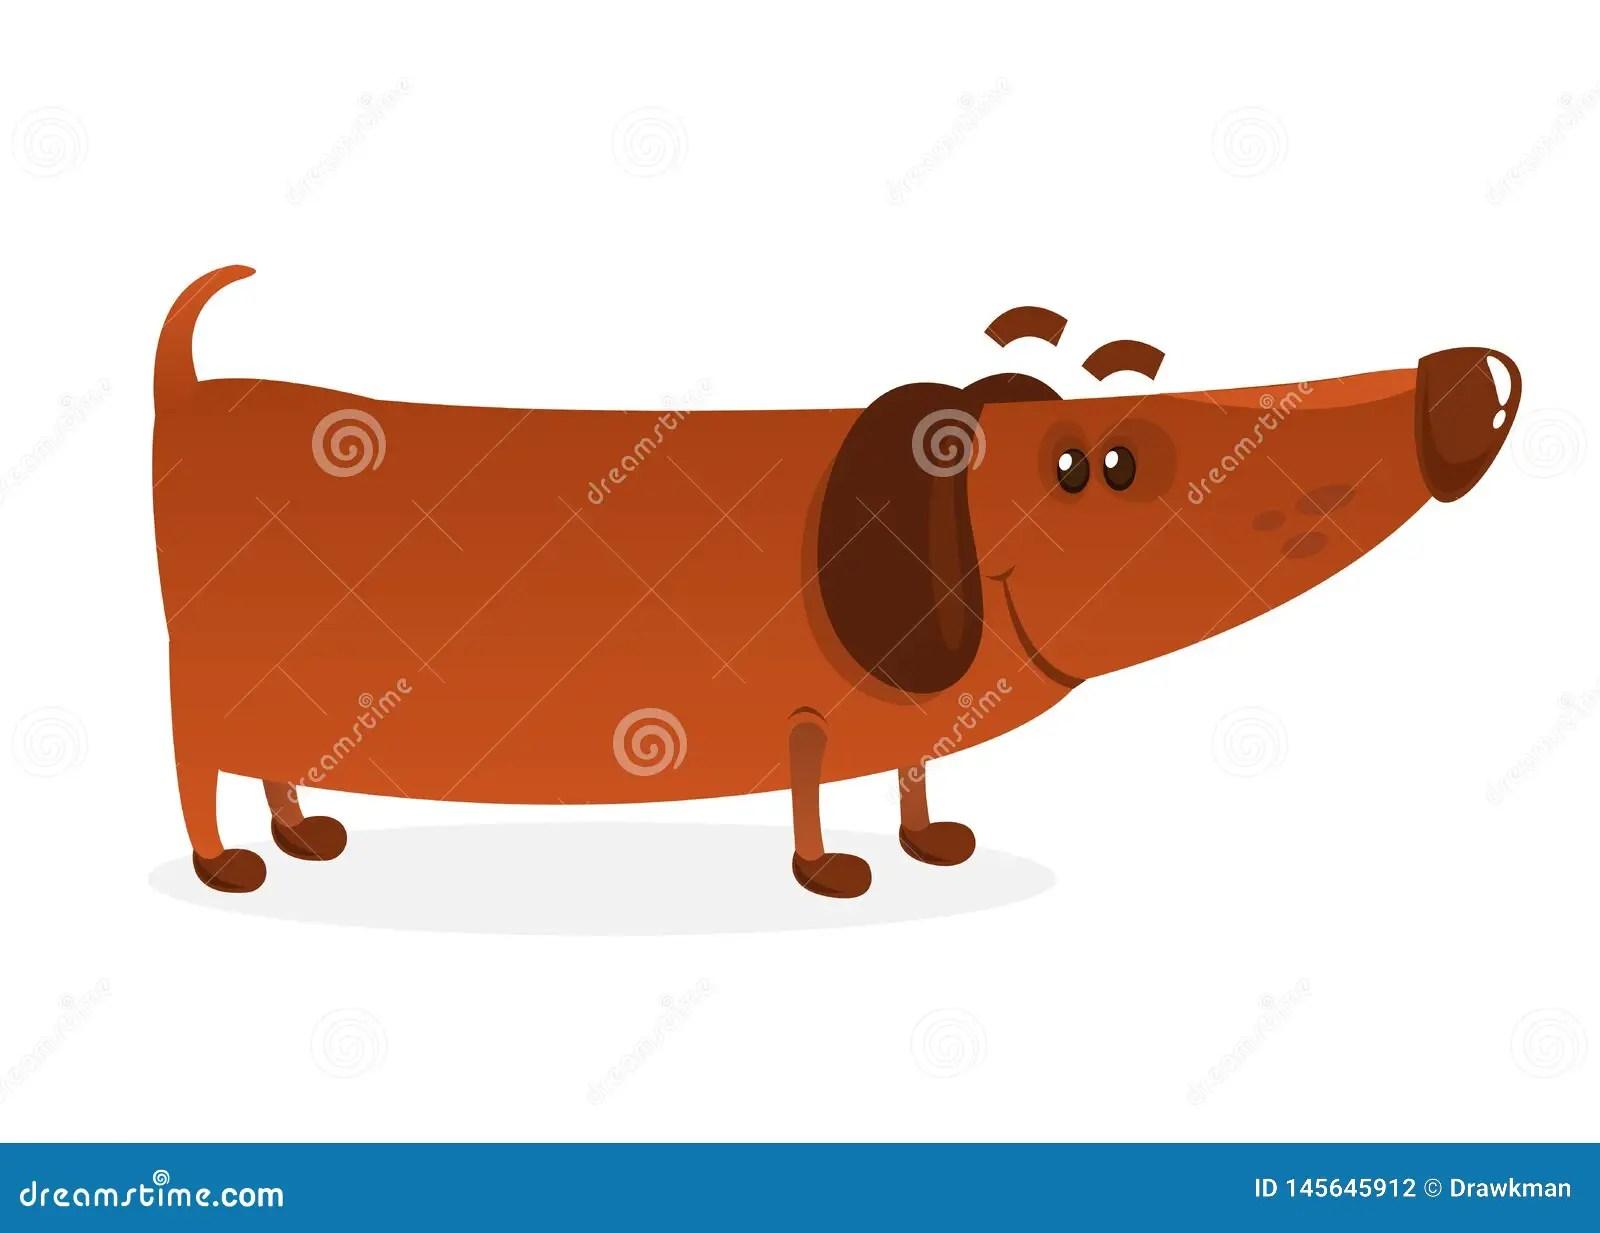 hight resolution of weiner dog stock illustrations 247 weiner dog stock illustrations vectors clipart dreamstime